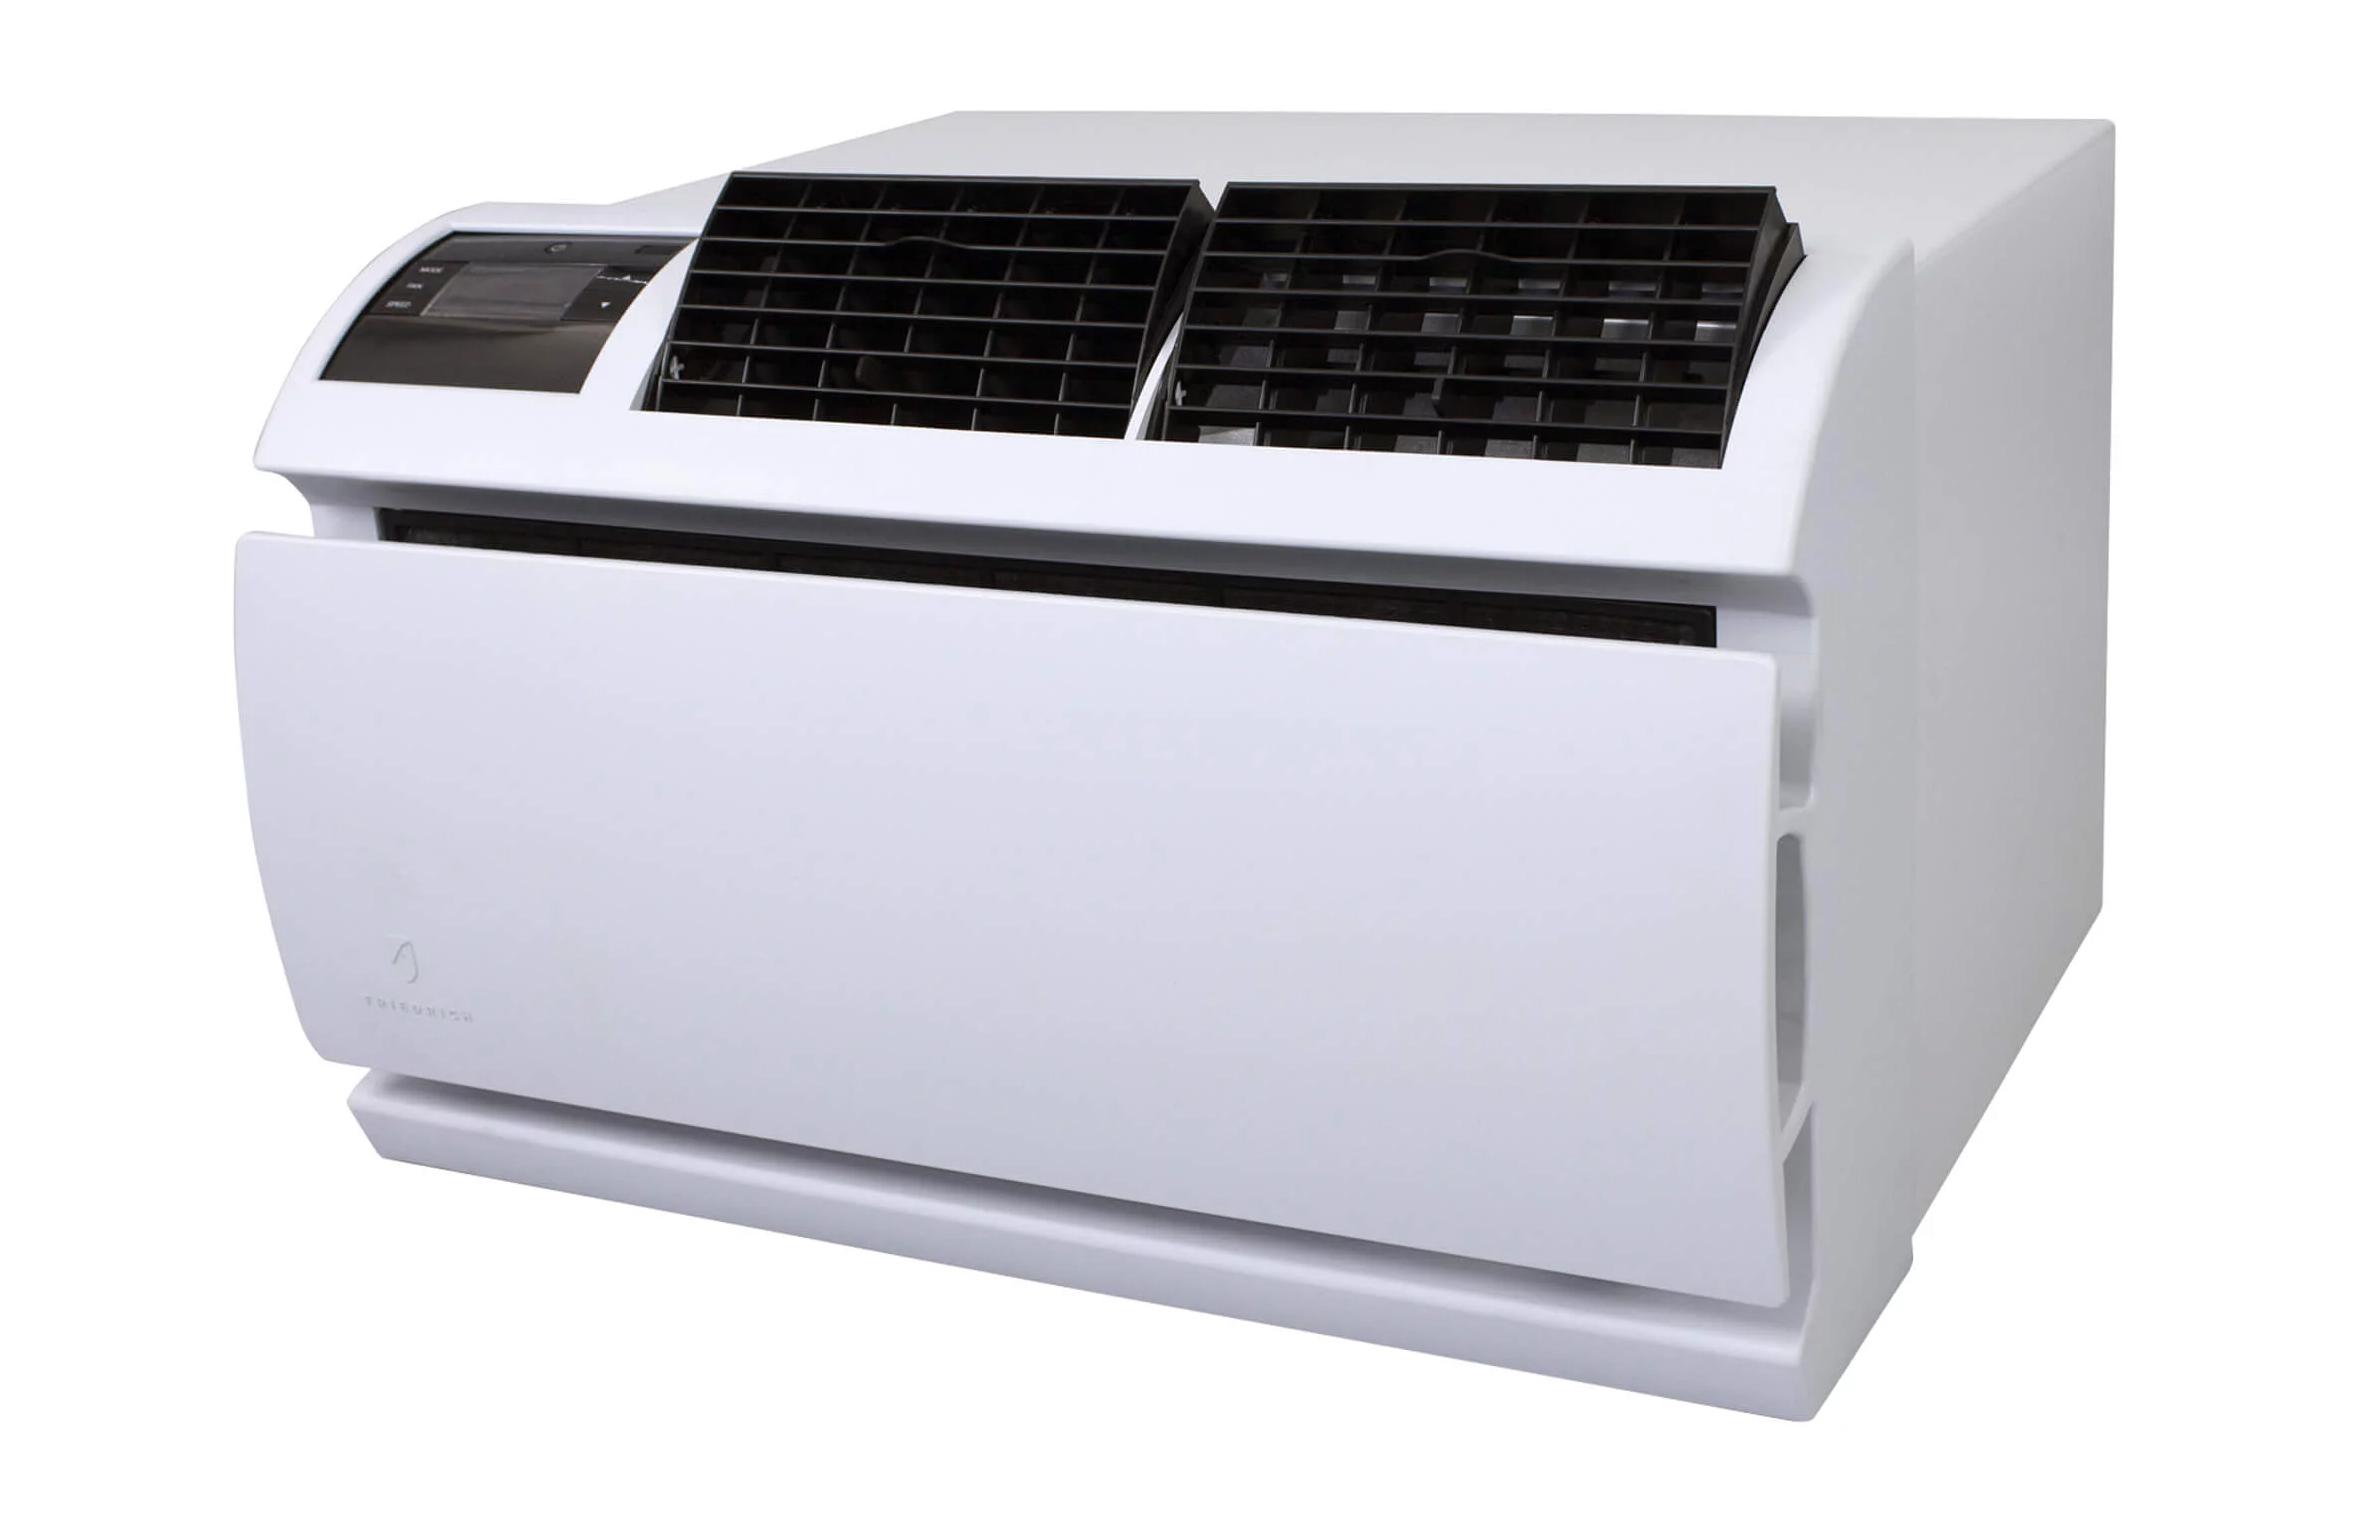 Friedrich WET12A33A Wallmaster Series 12000 BTU Smart WiFi Through-the-Wall Air Conditioner with Electric Heat - 208/230 Volt